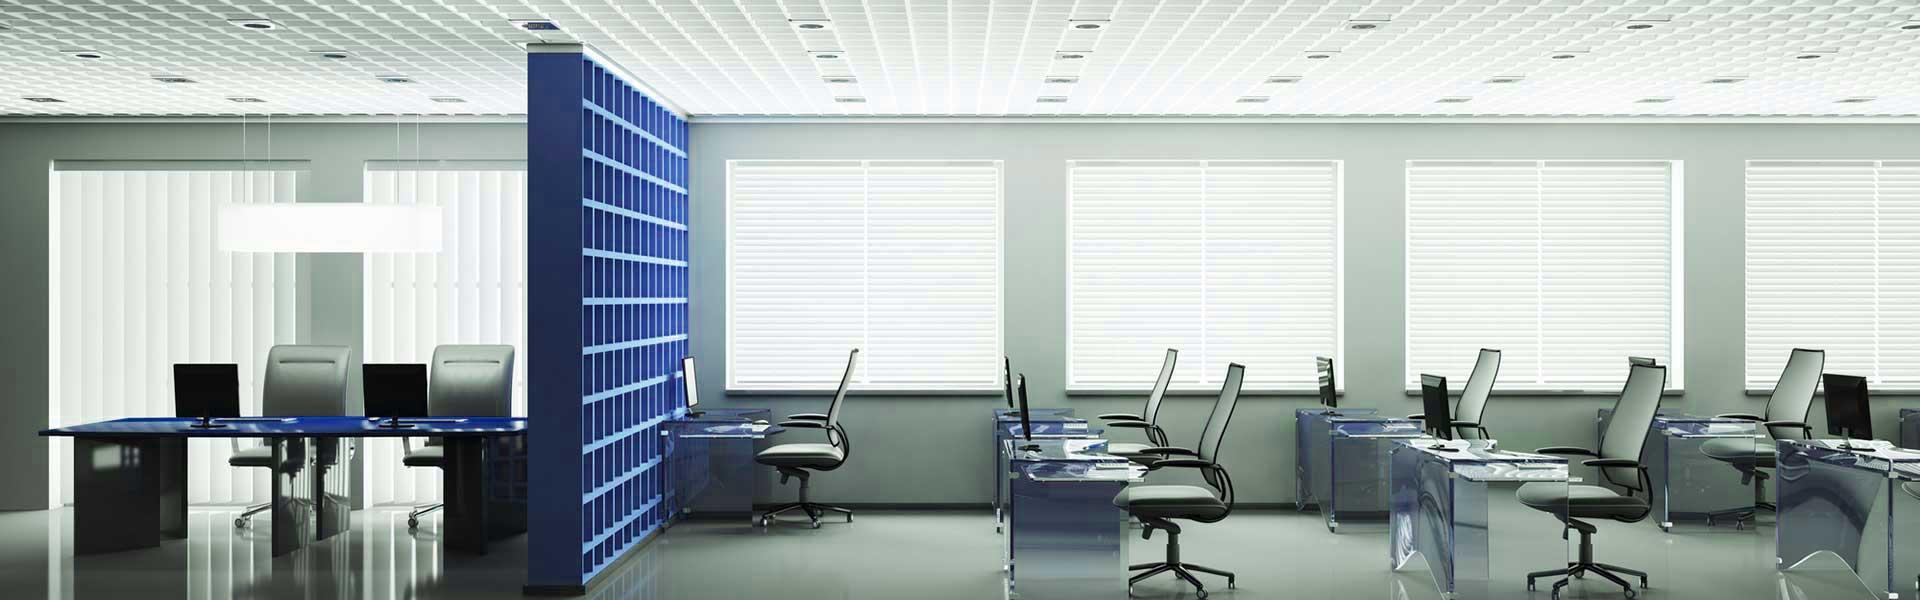 Office Furniture in Wakefield